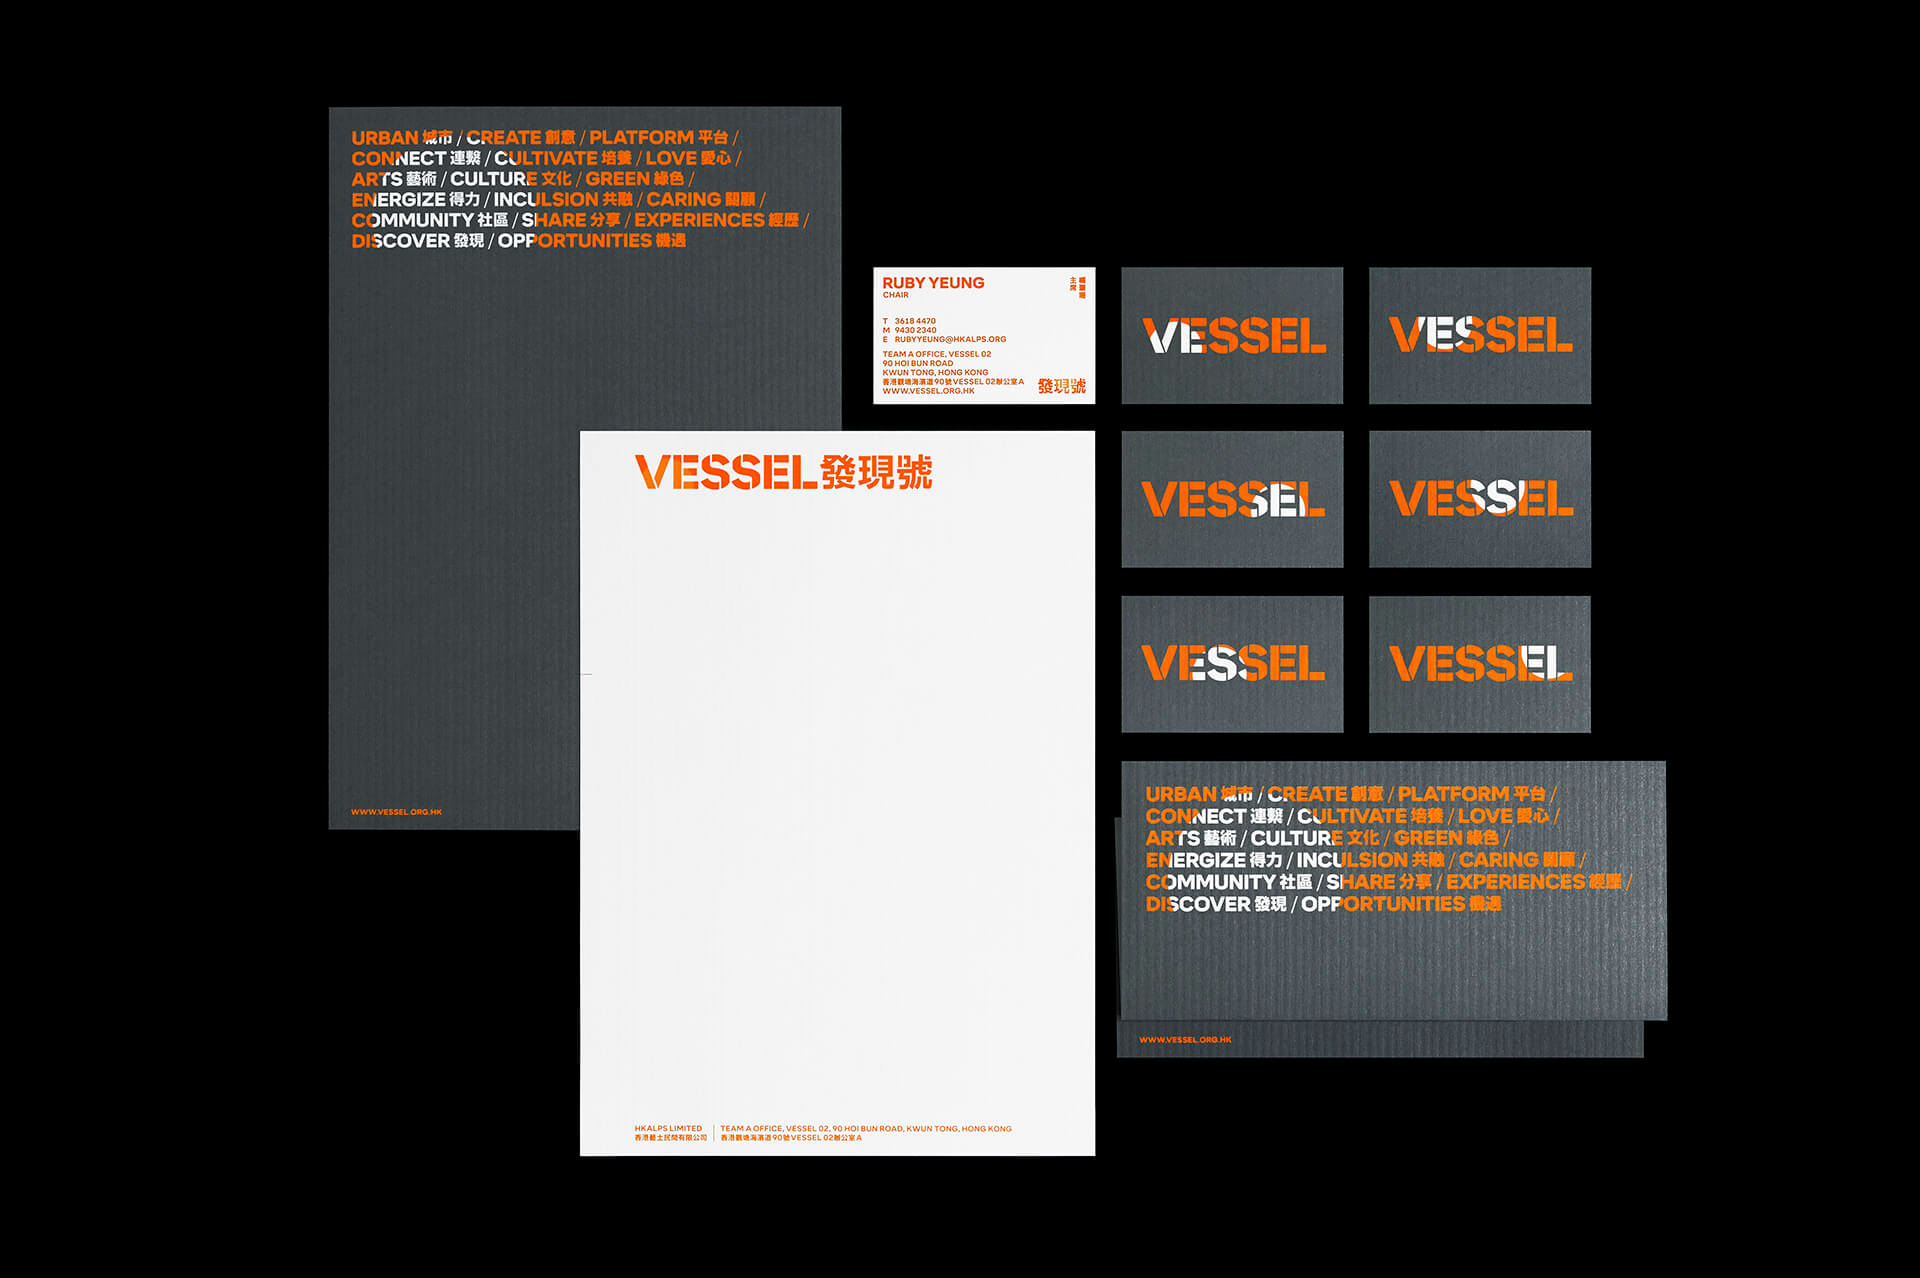 vessel_05